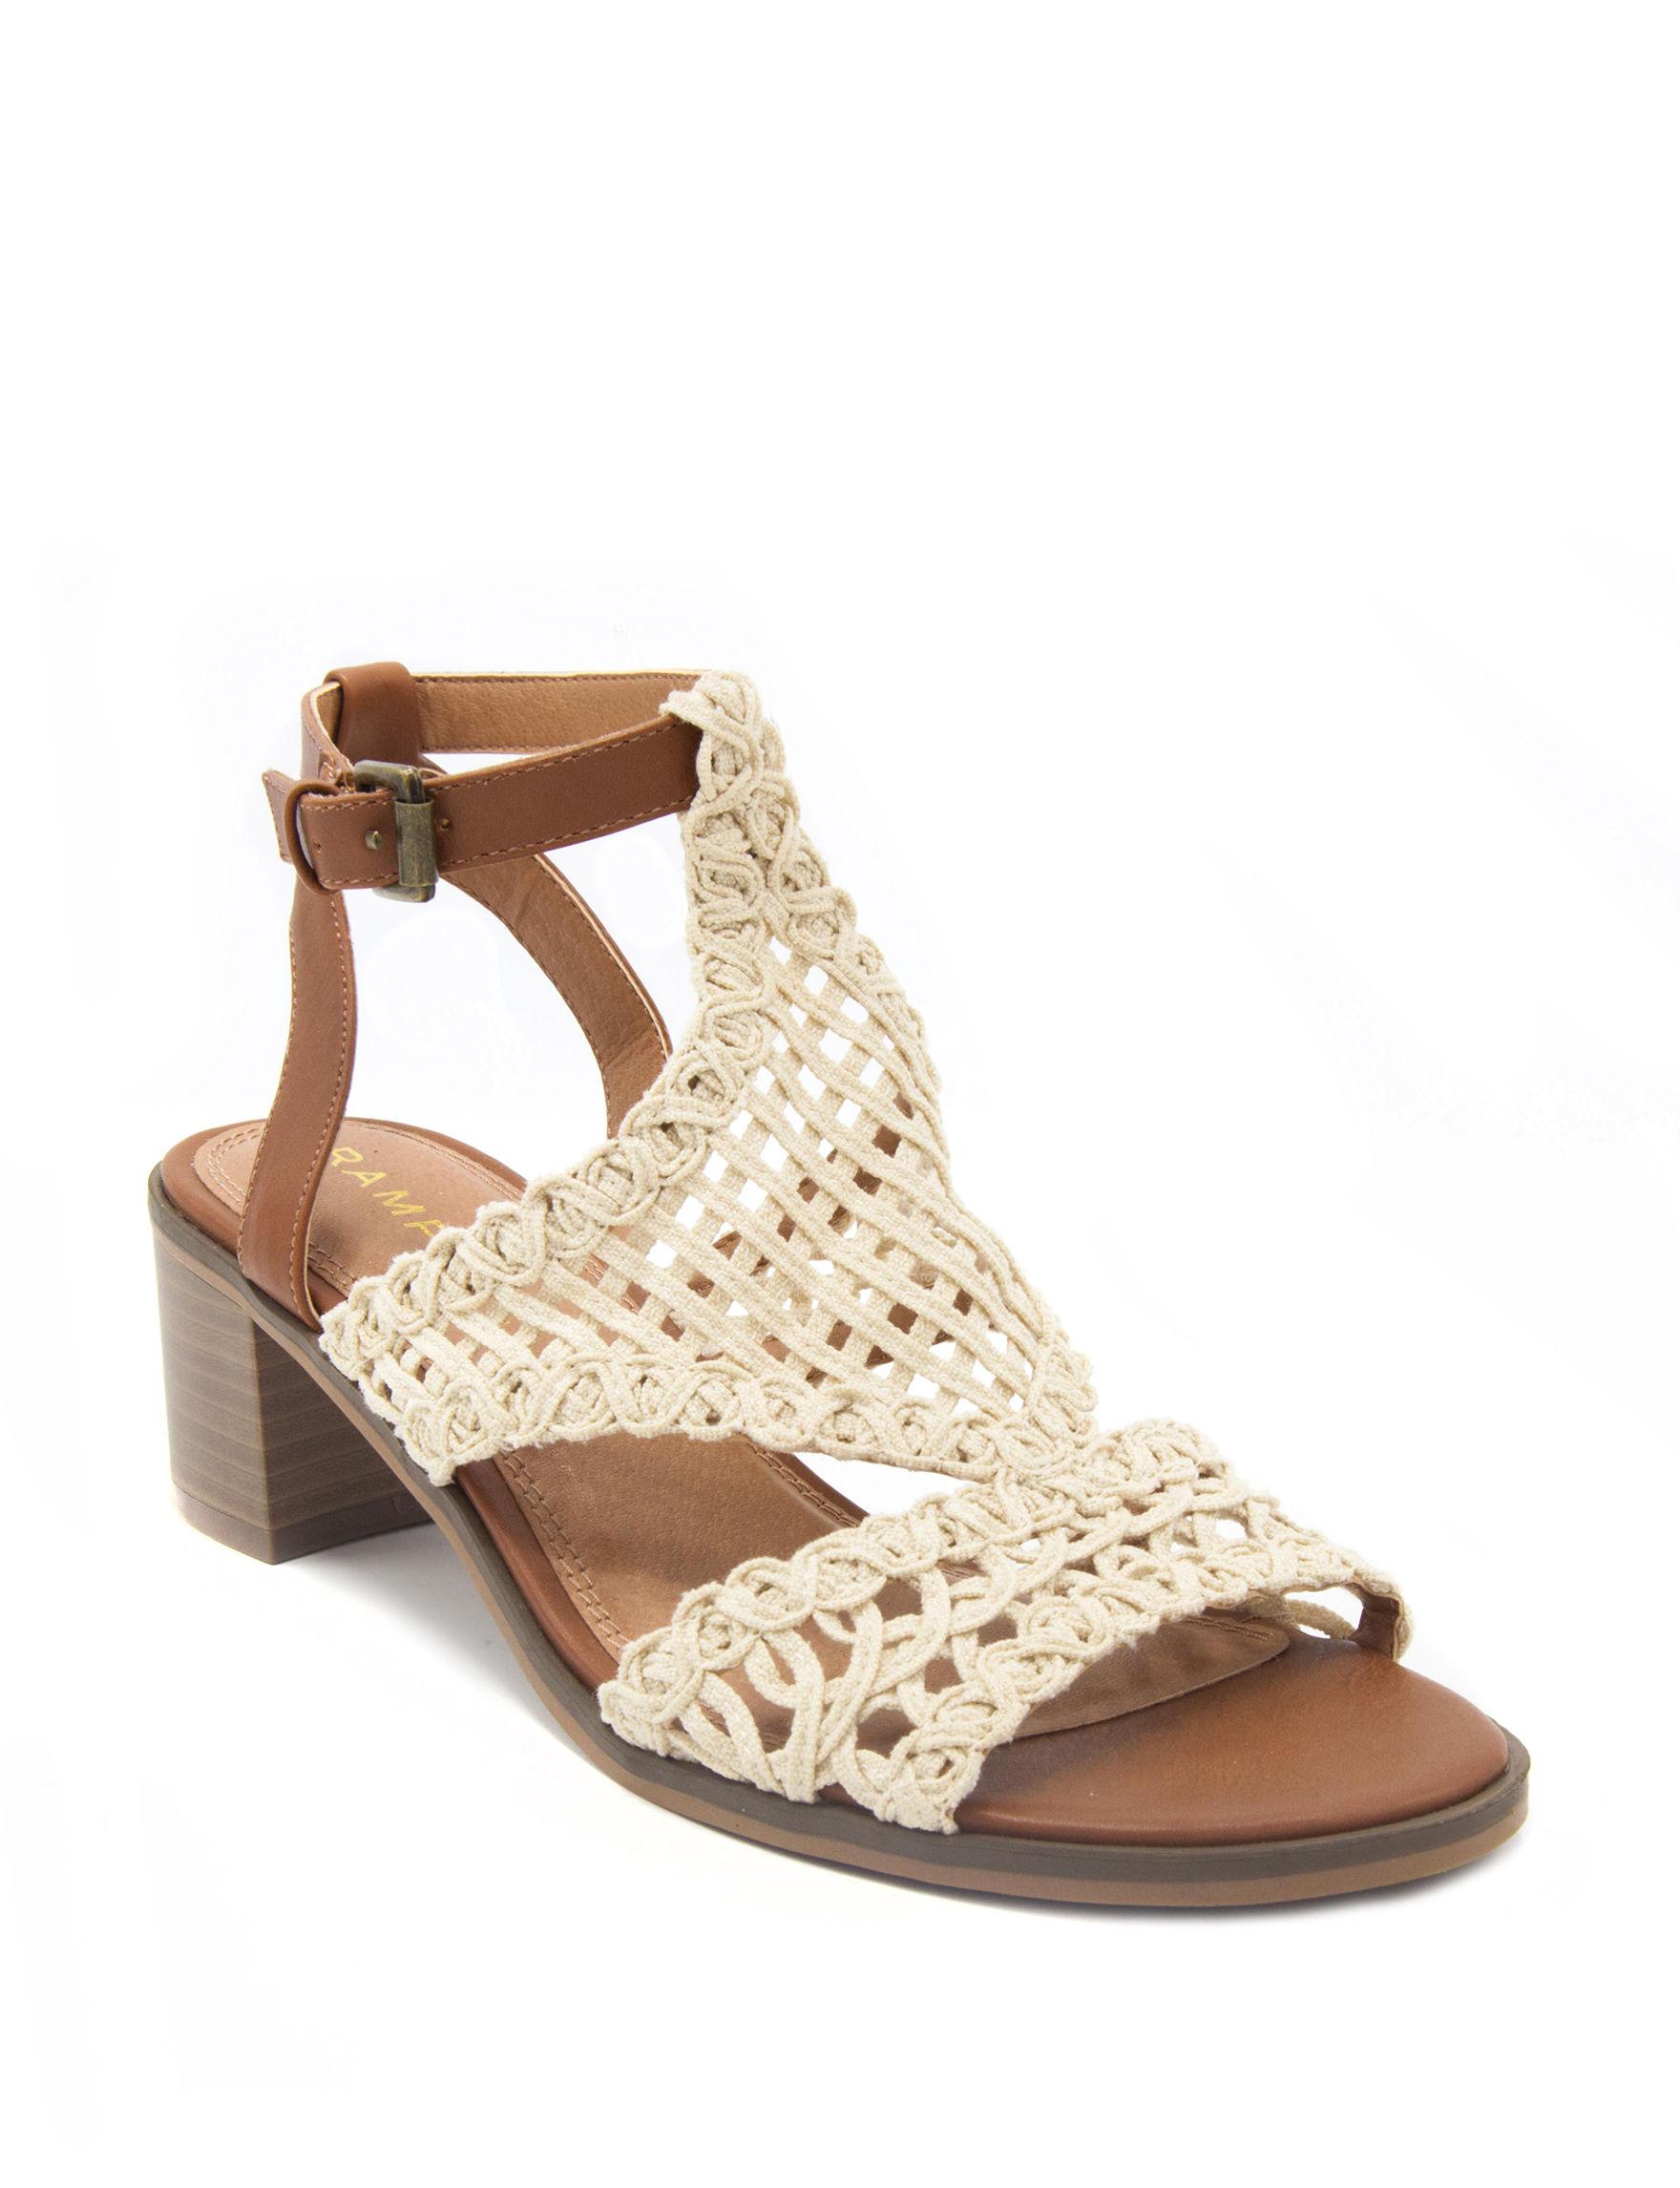 Rampage Cognac Heeled Sandals